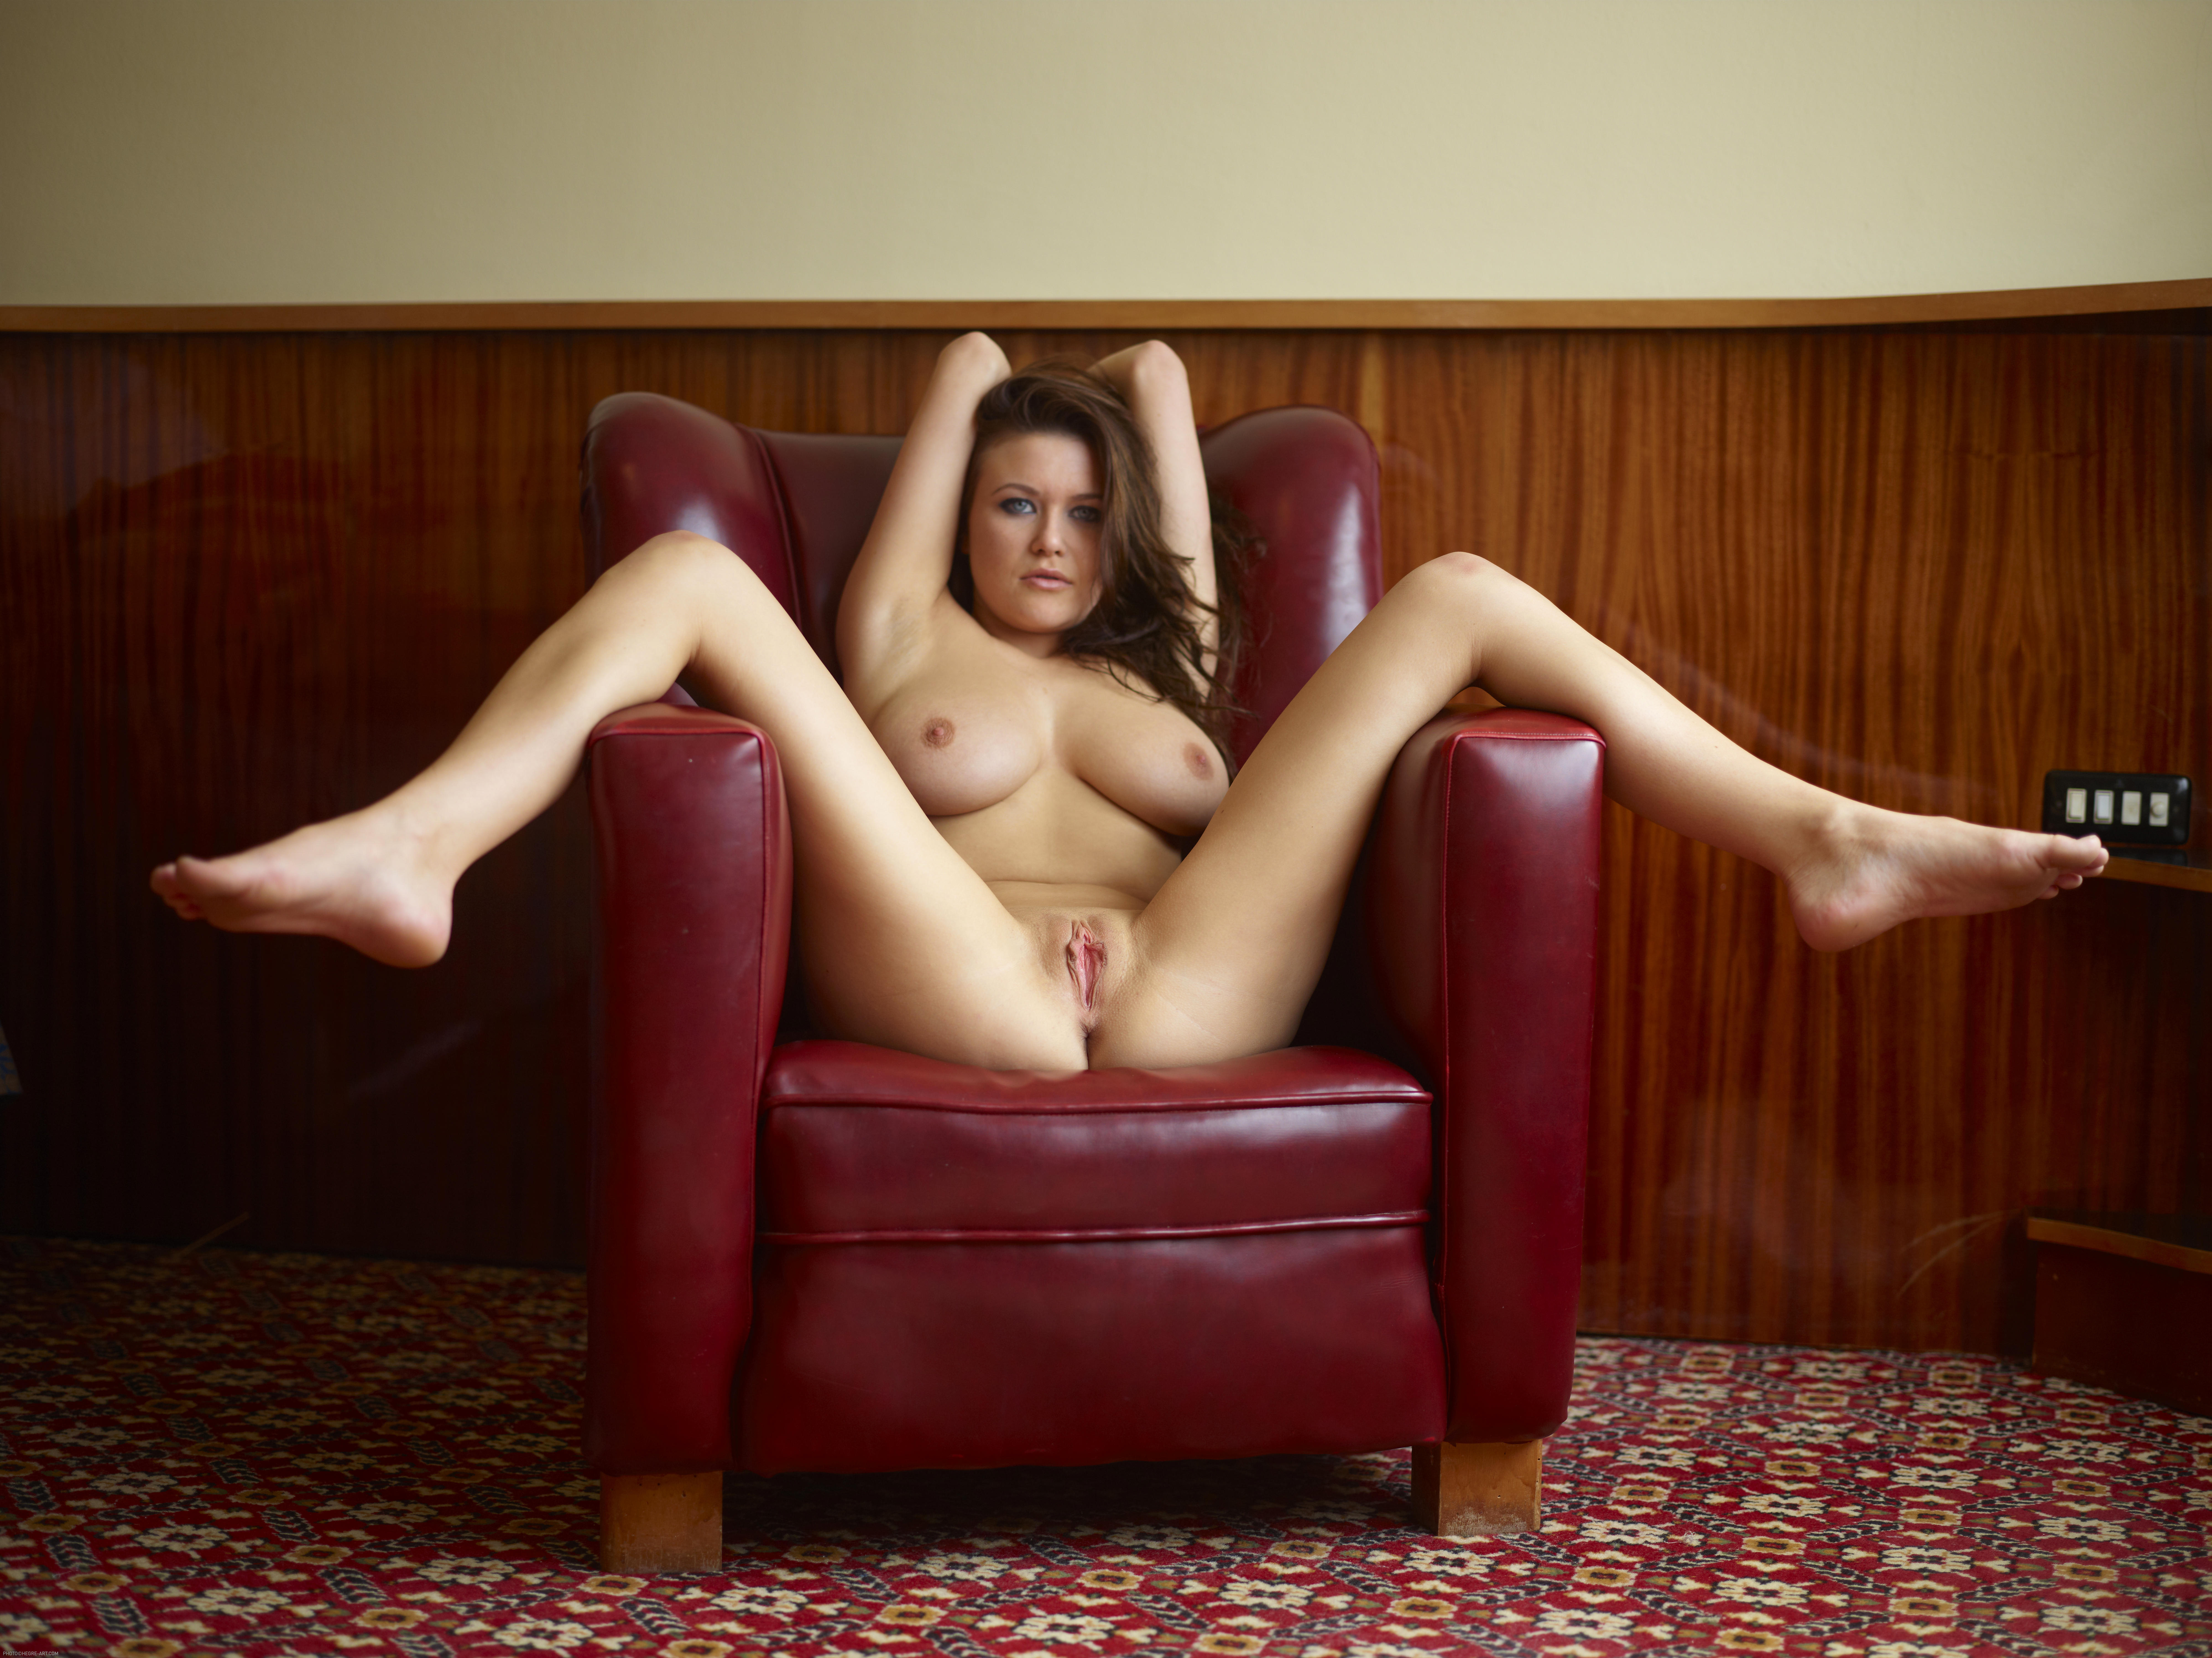 Раздвигает ноги и соблазняет, Студентка соблазнила молодого препода и раздвинула 24 фотография